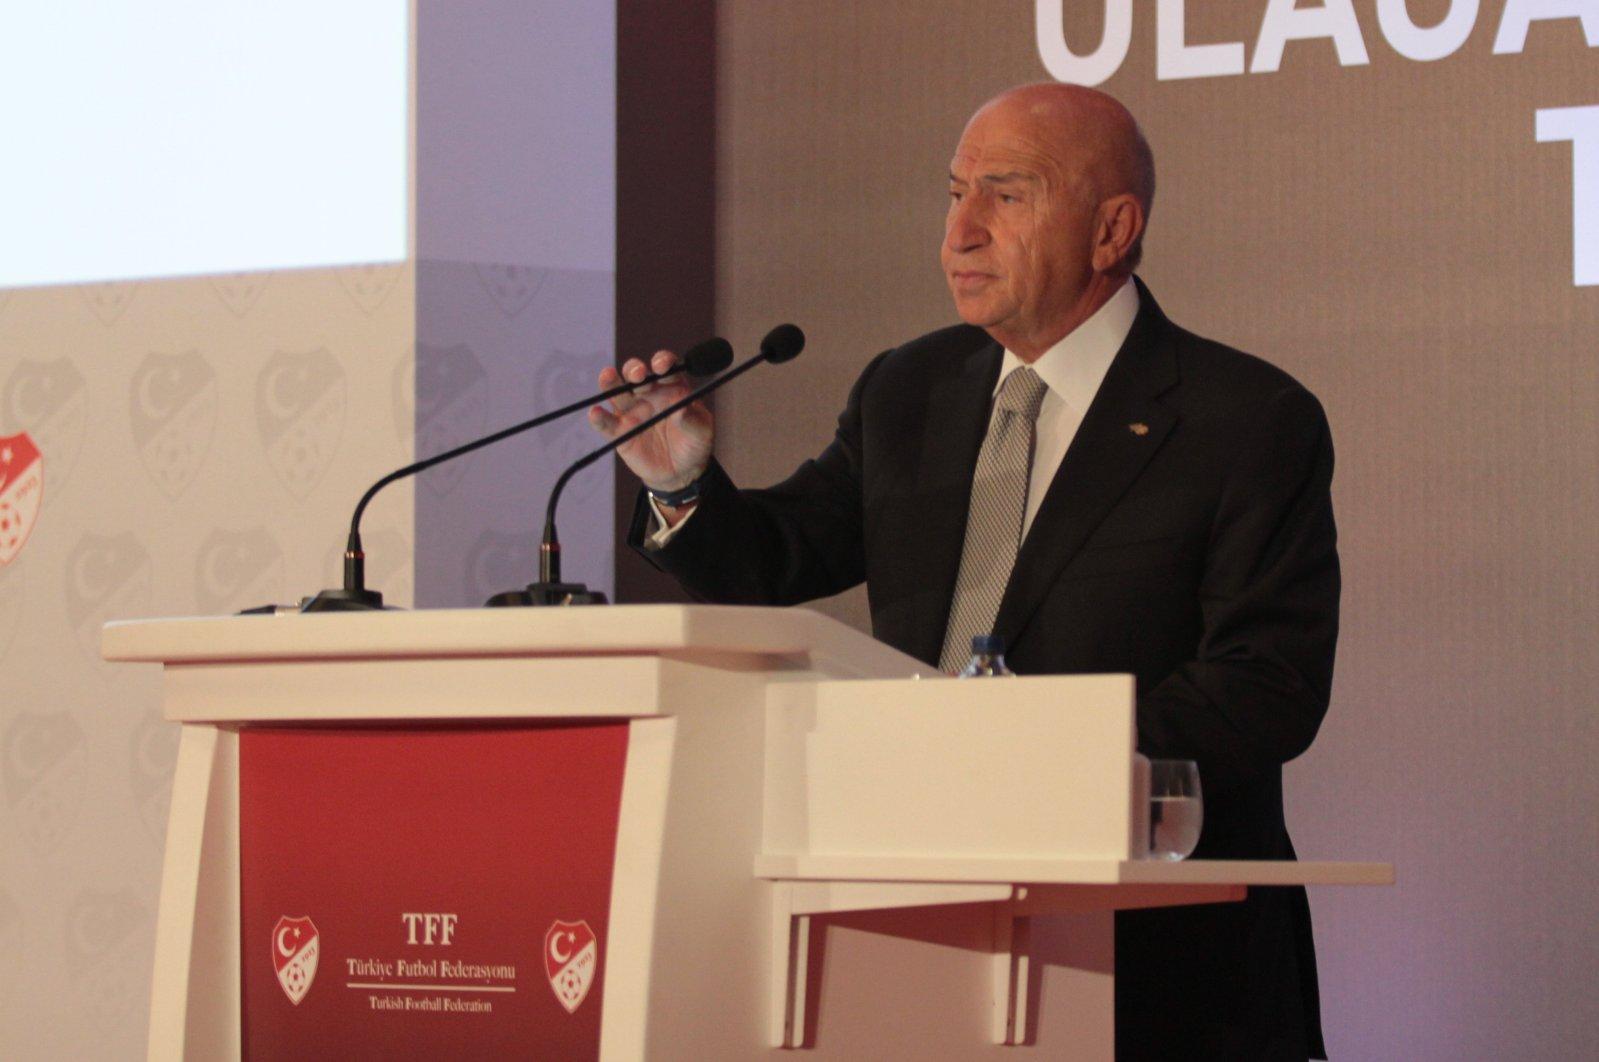 TFF President Nihat Özdemir speaks at a budget meeting in the capital Ankara, Turkey, Sept. 1, 2020. (IHA Photo)